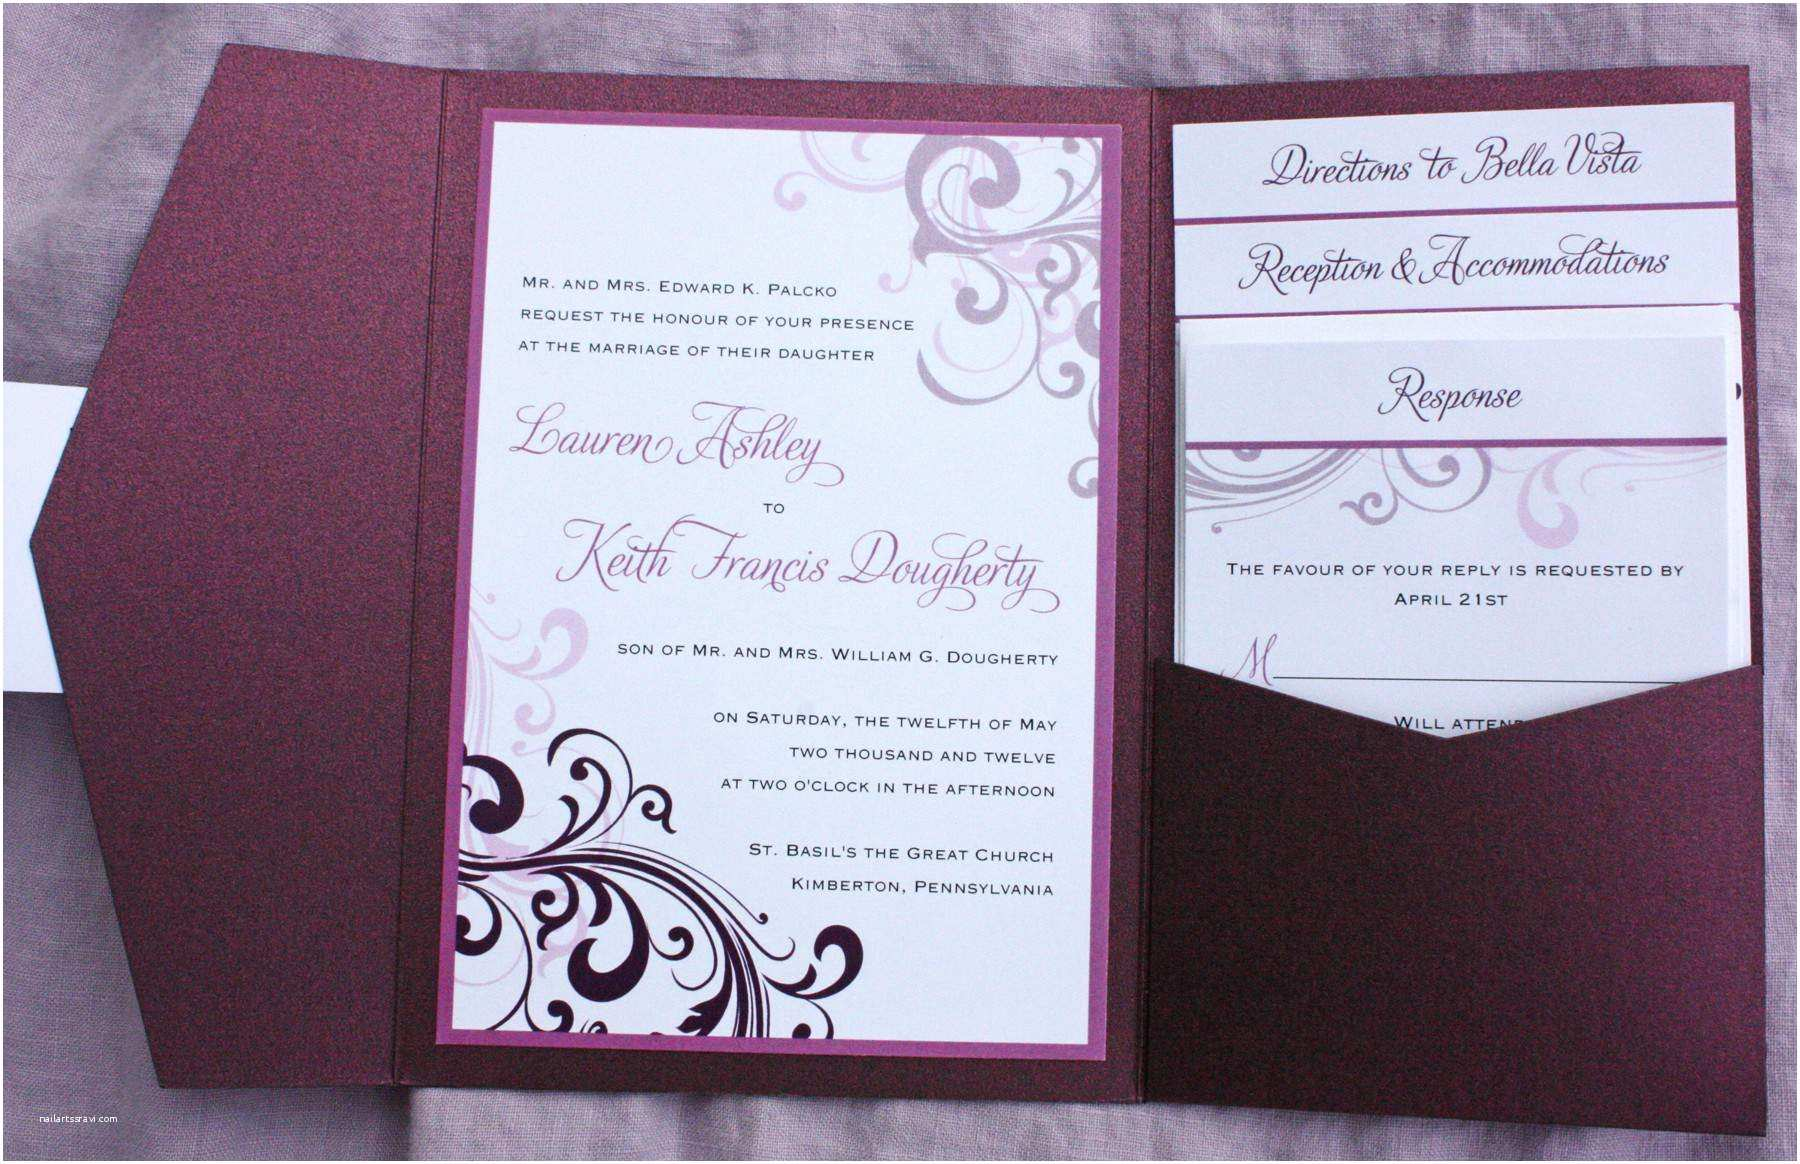 Burgundy and White Wedding Invitations Design Your Wedding Invitation Rectangle Potrait Burgundy